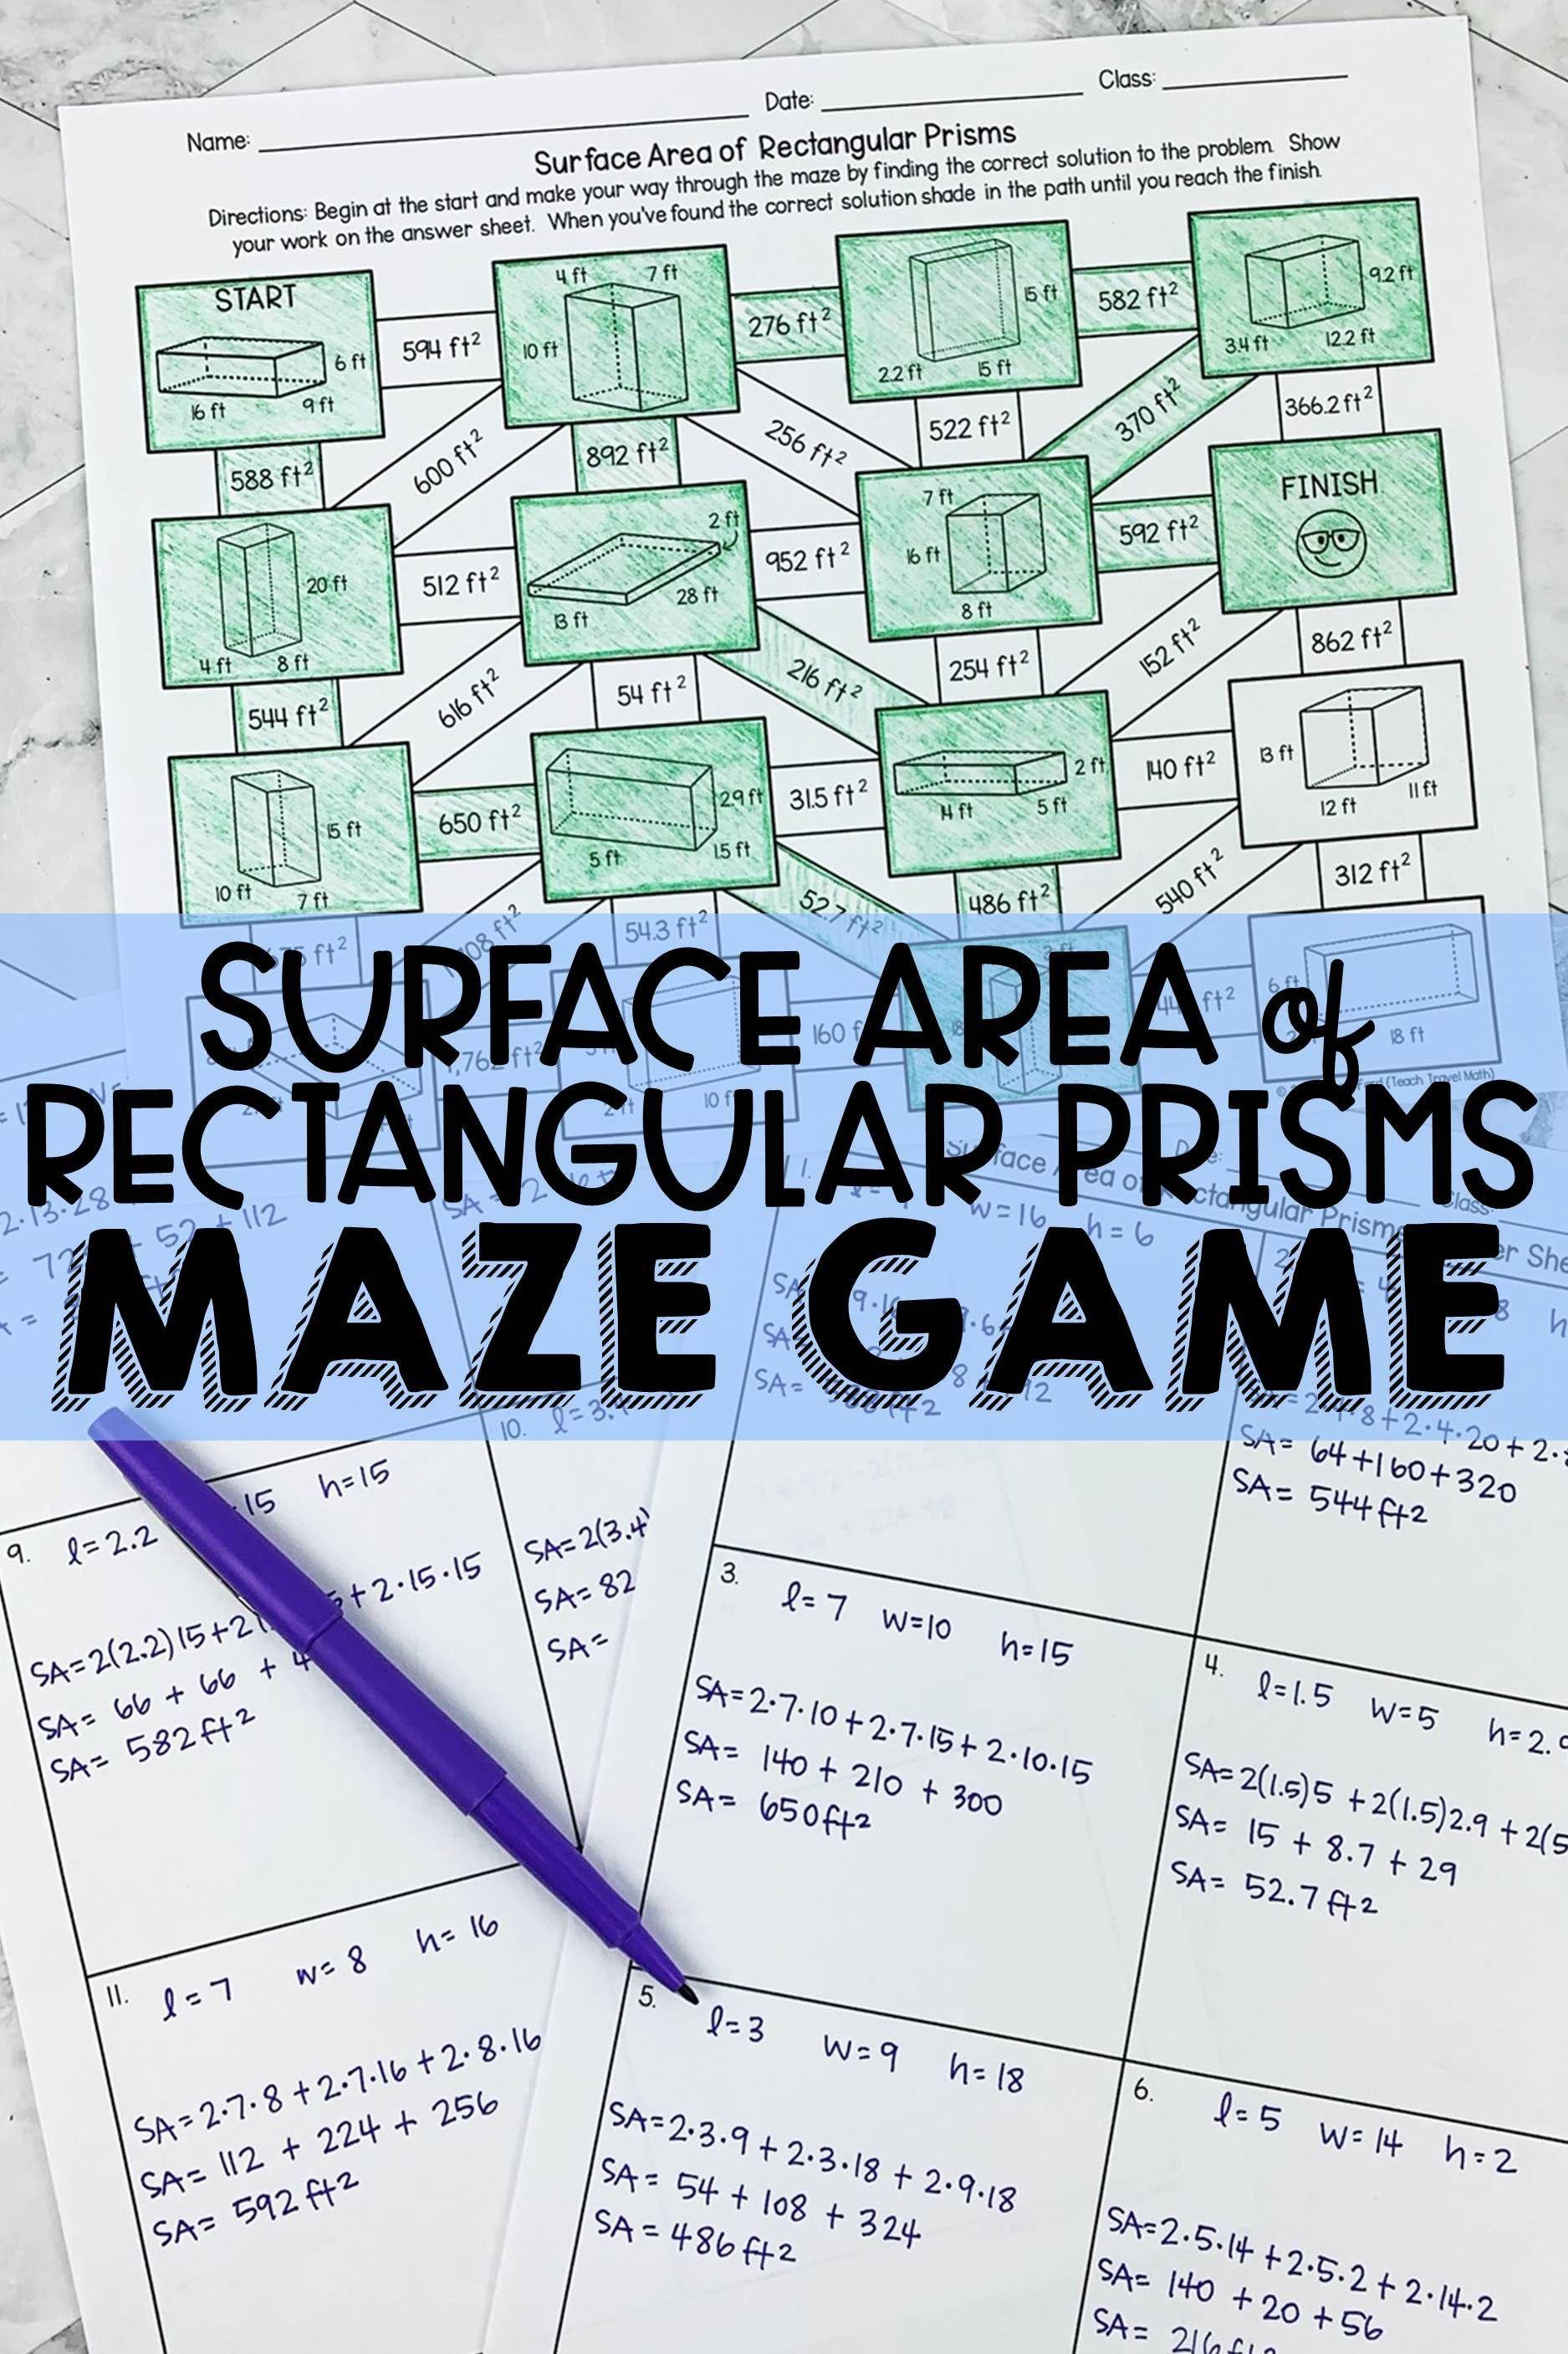 Surface Area Of Rectangular Prisms Maze Rectangular Prisms Math Maze Surface Area [ 2814 x 1875 Pixel ]